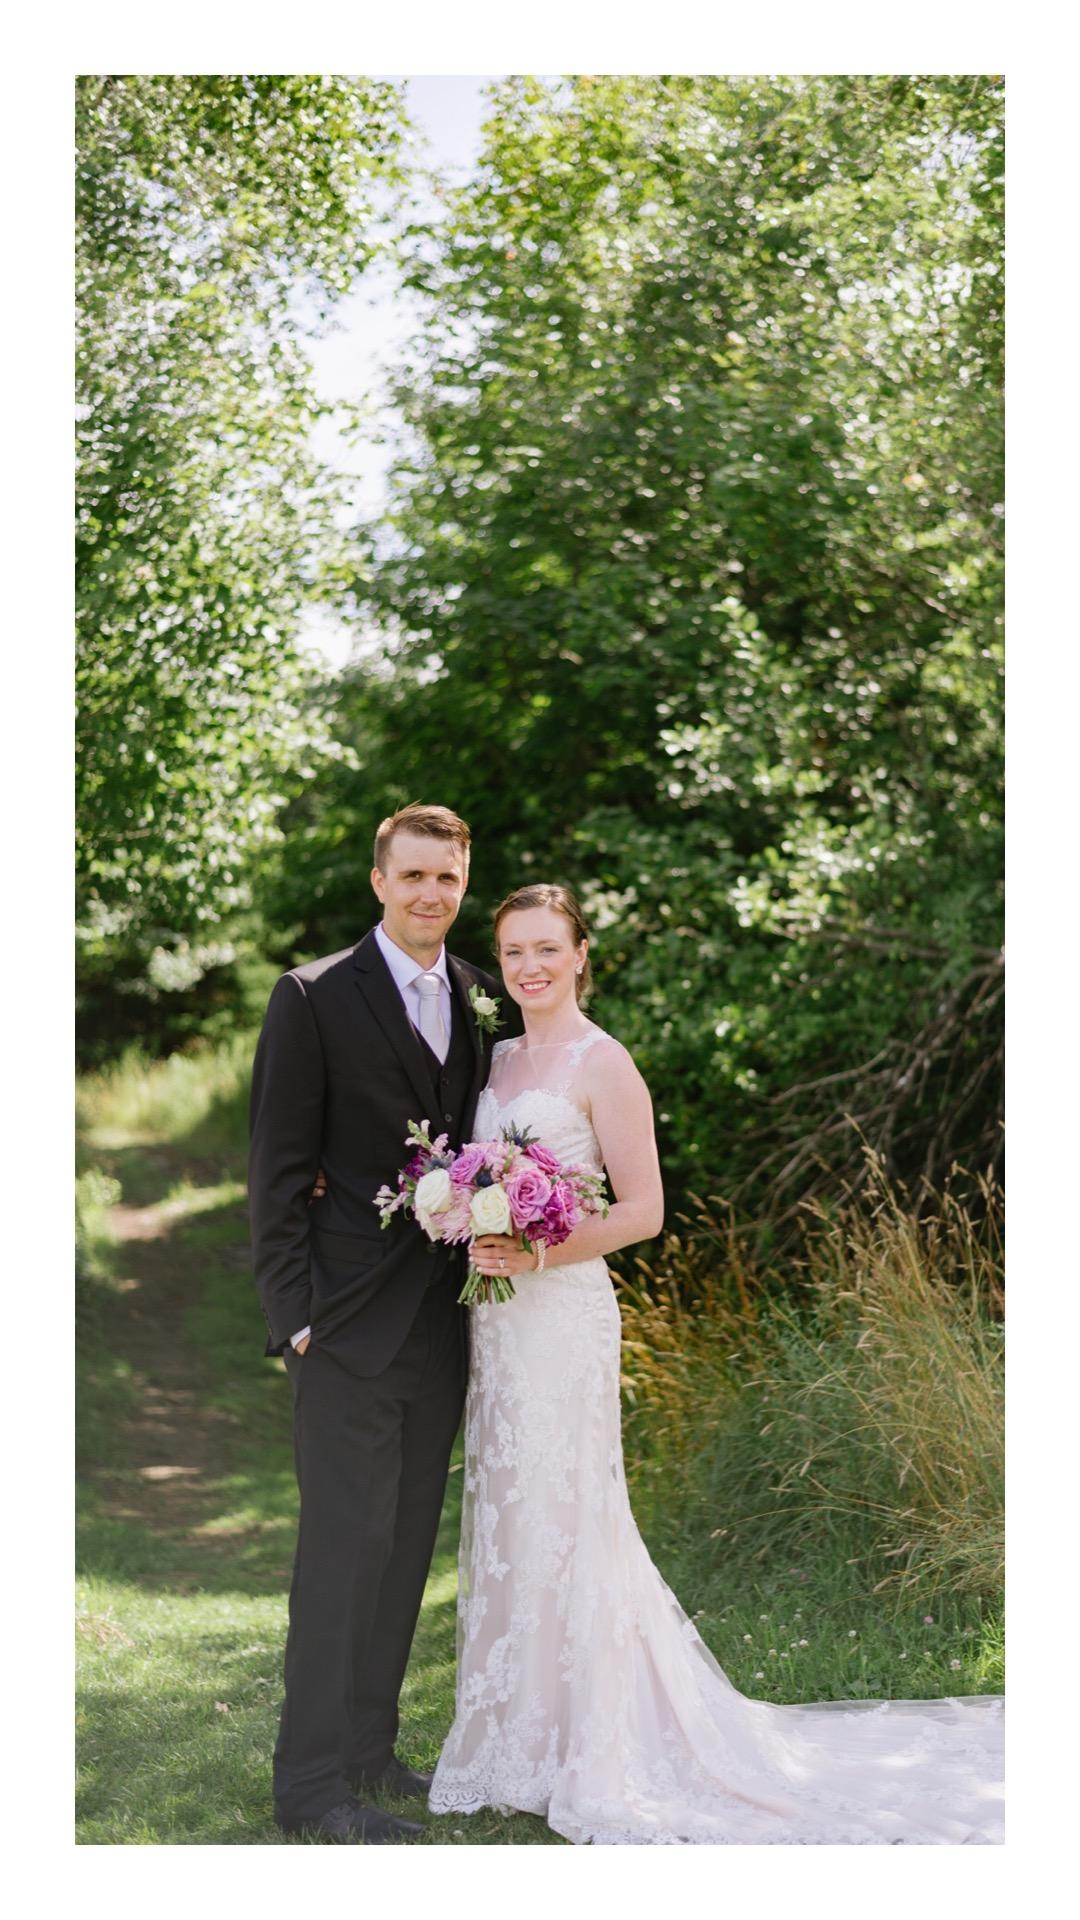 Martina & Scott Halifax Wedding Photographer - Sinead Dubeau Photography 10